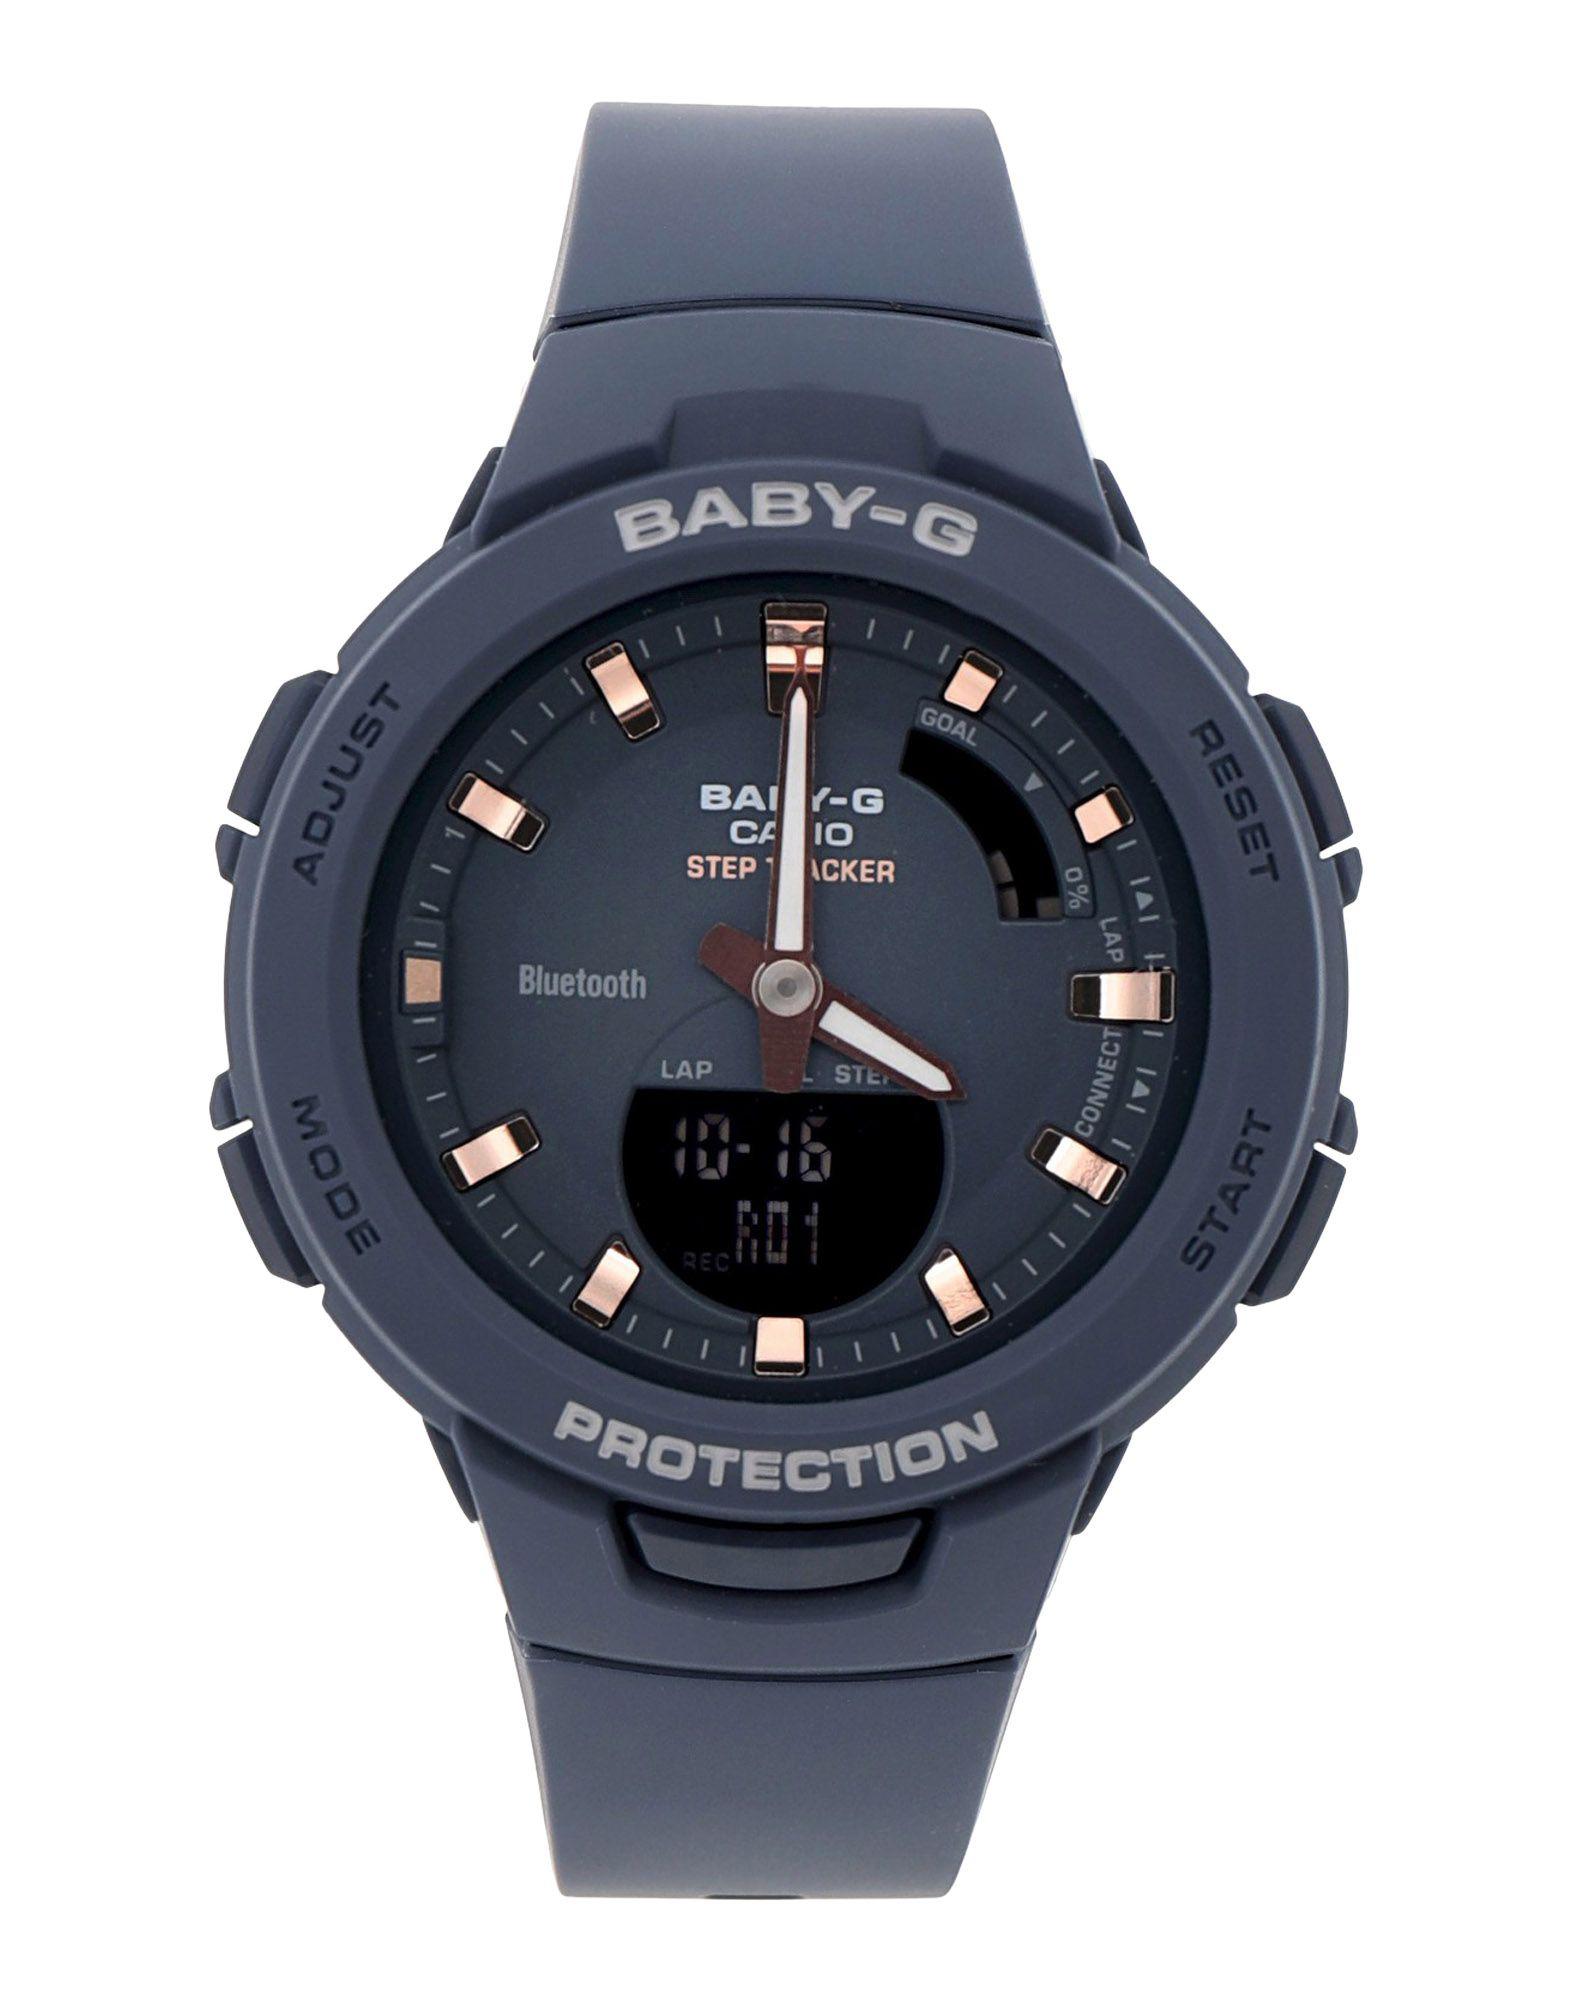 CASIO BABY-G Наручные часы наручные часы casio baby g bgd 560 7e